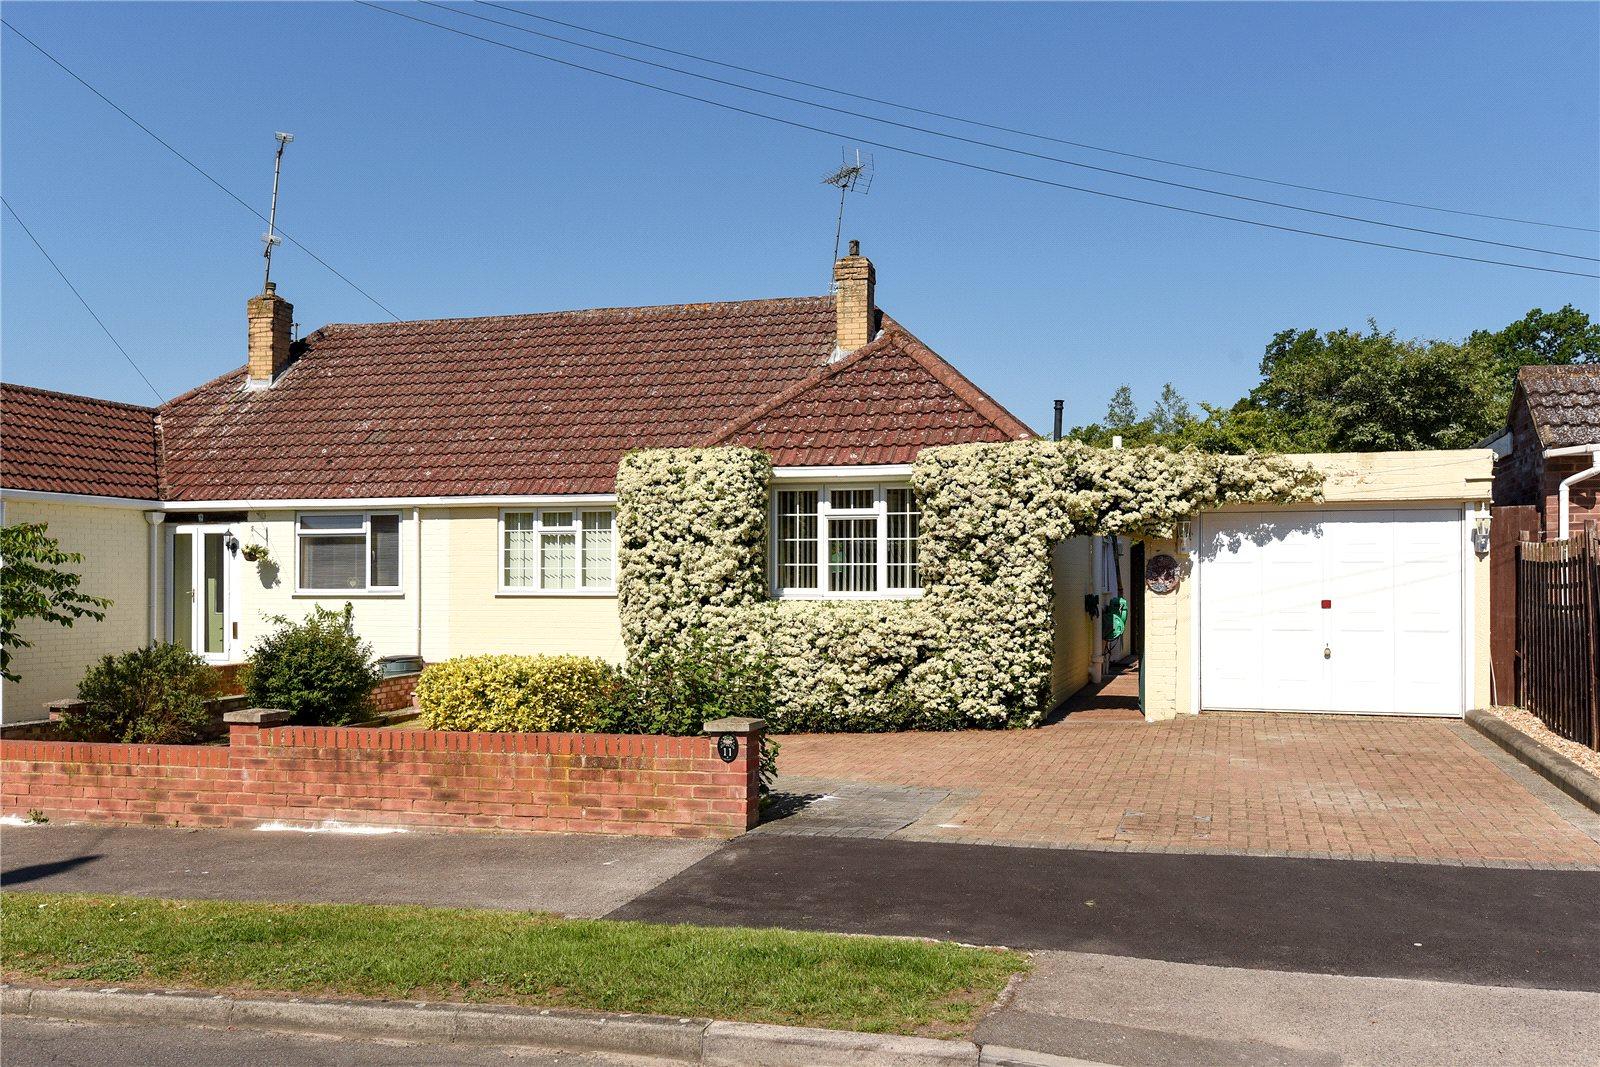 2 Bedrooms Semi Detached Bungalow for sale in St. Michaels Road, Sandhurst, Berkshire, GU47